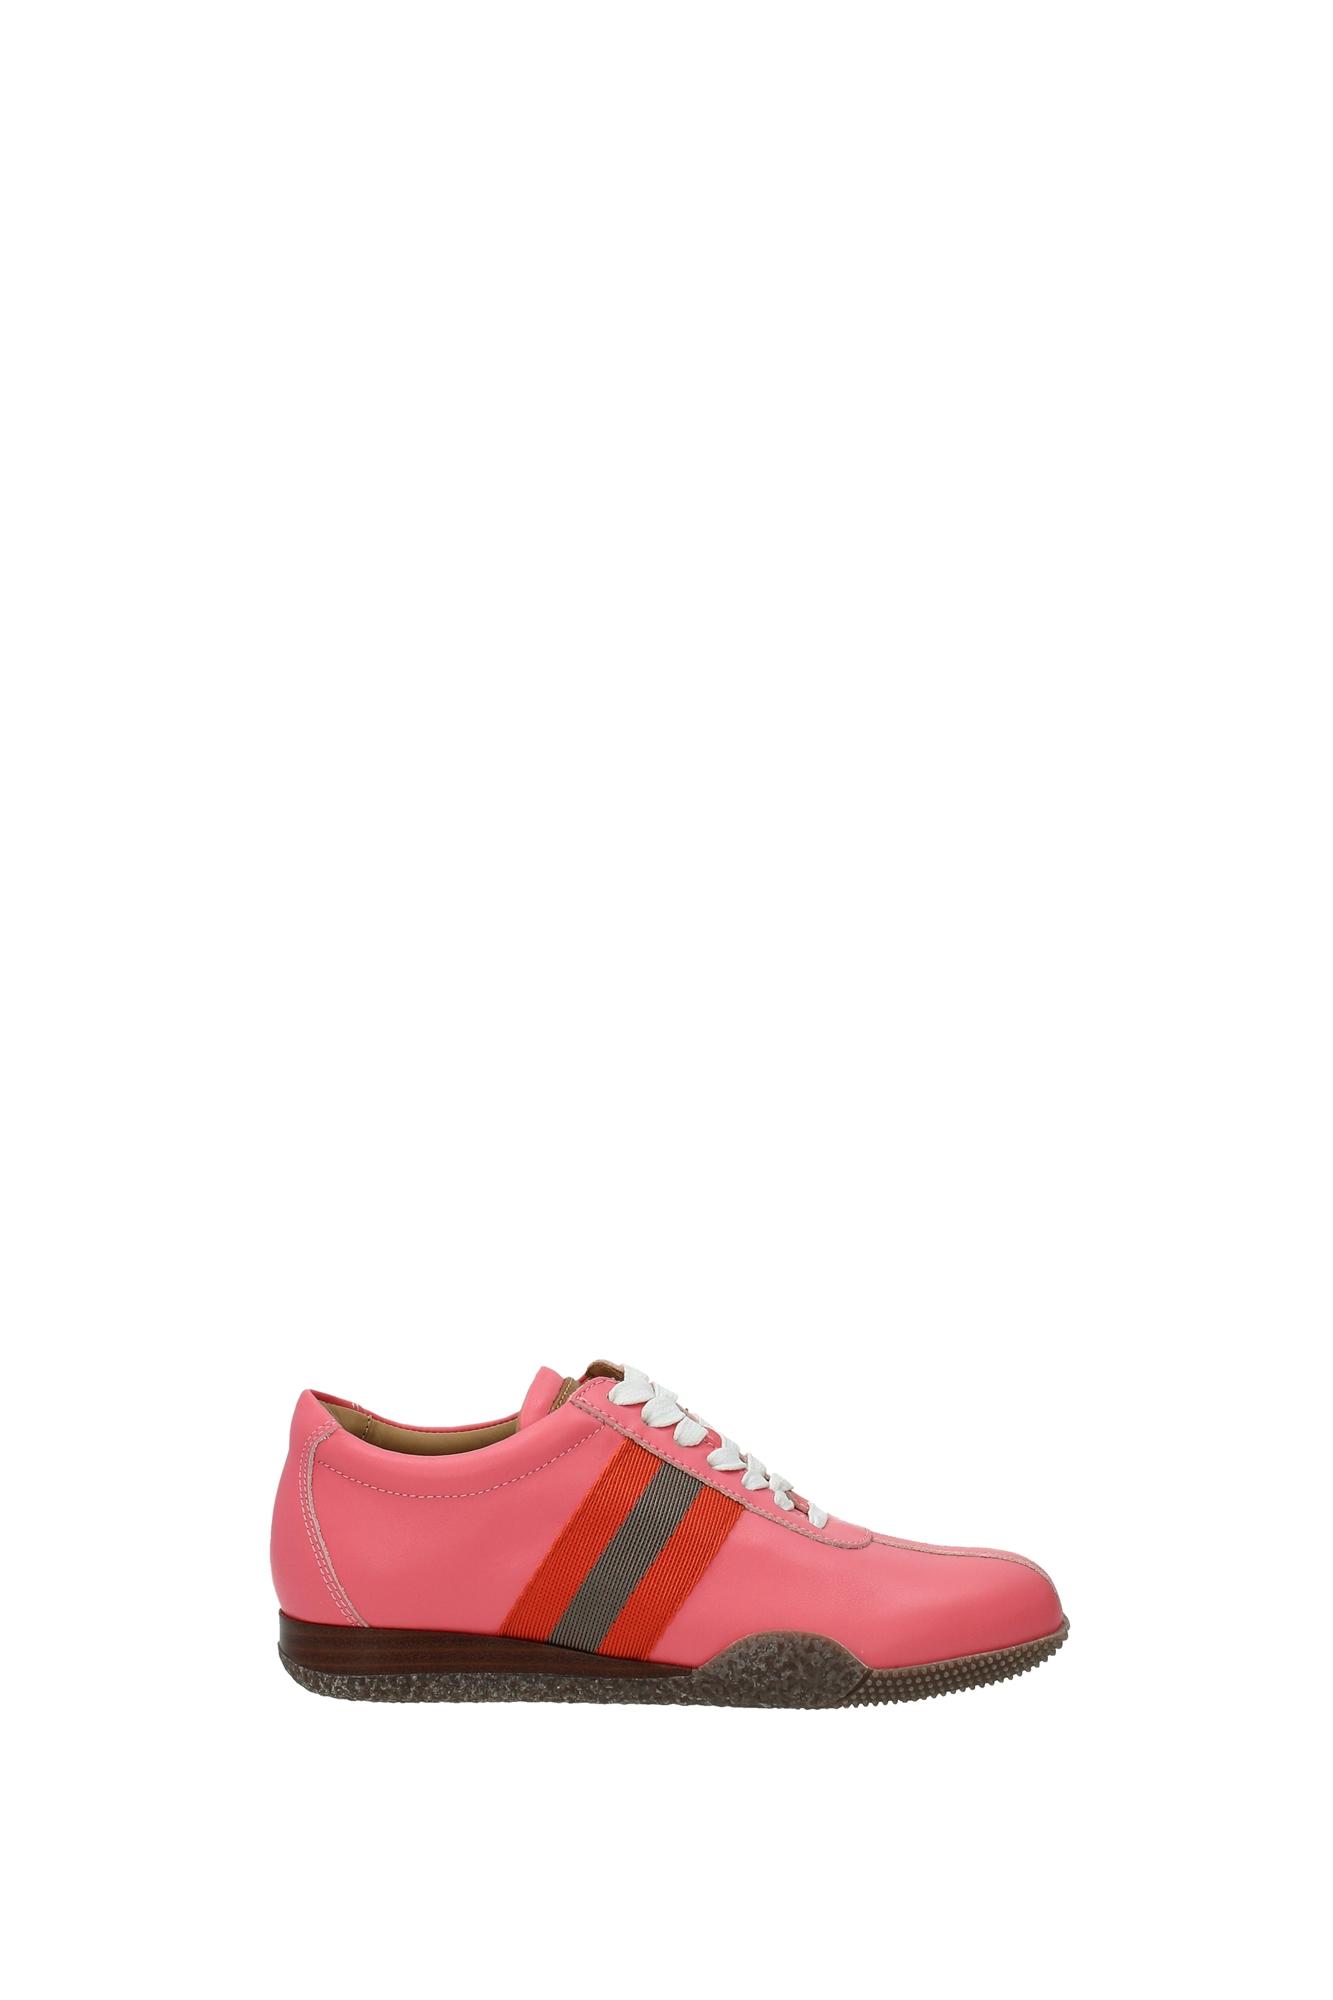 Sneakers (FRANCISCA606205809) Bally Damen -  (FRANCISCA606205809) Sneakers 974651